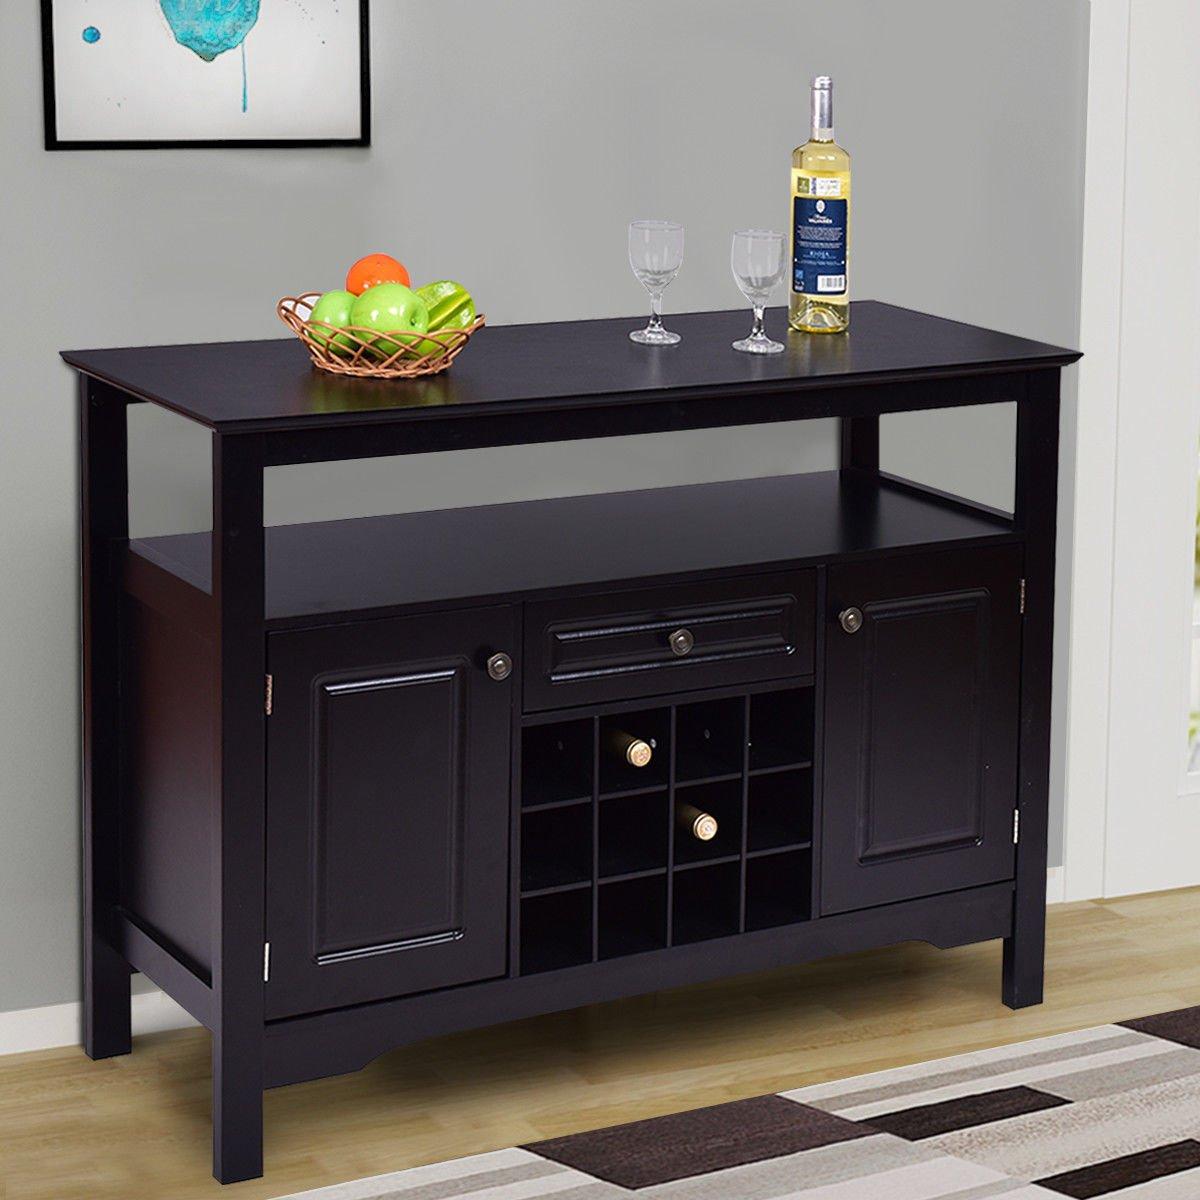 Amazon.com   Giantex Black Buffet Server Wood Cabinet Sideboard Cupboard  Table With/wine Rack   Buffets U0026 Sideboards